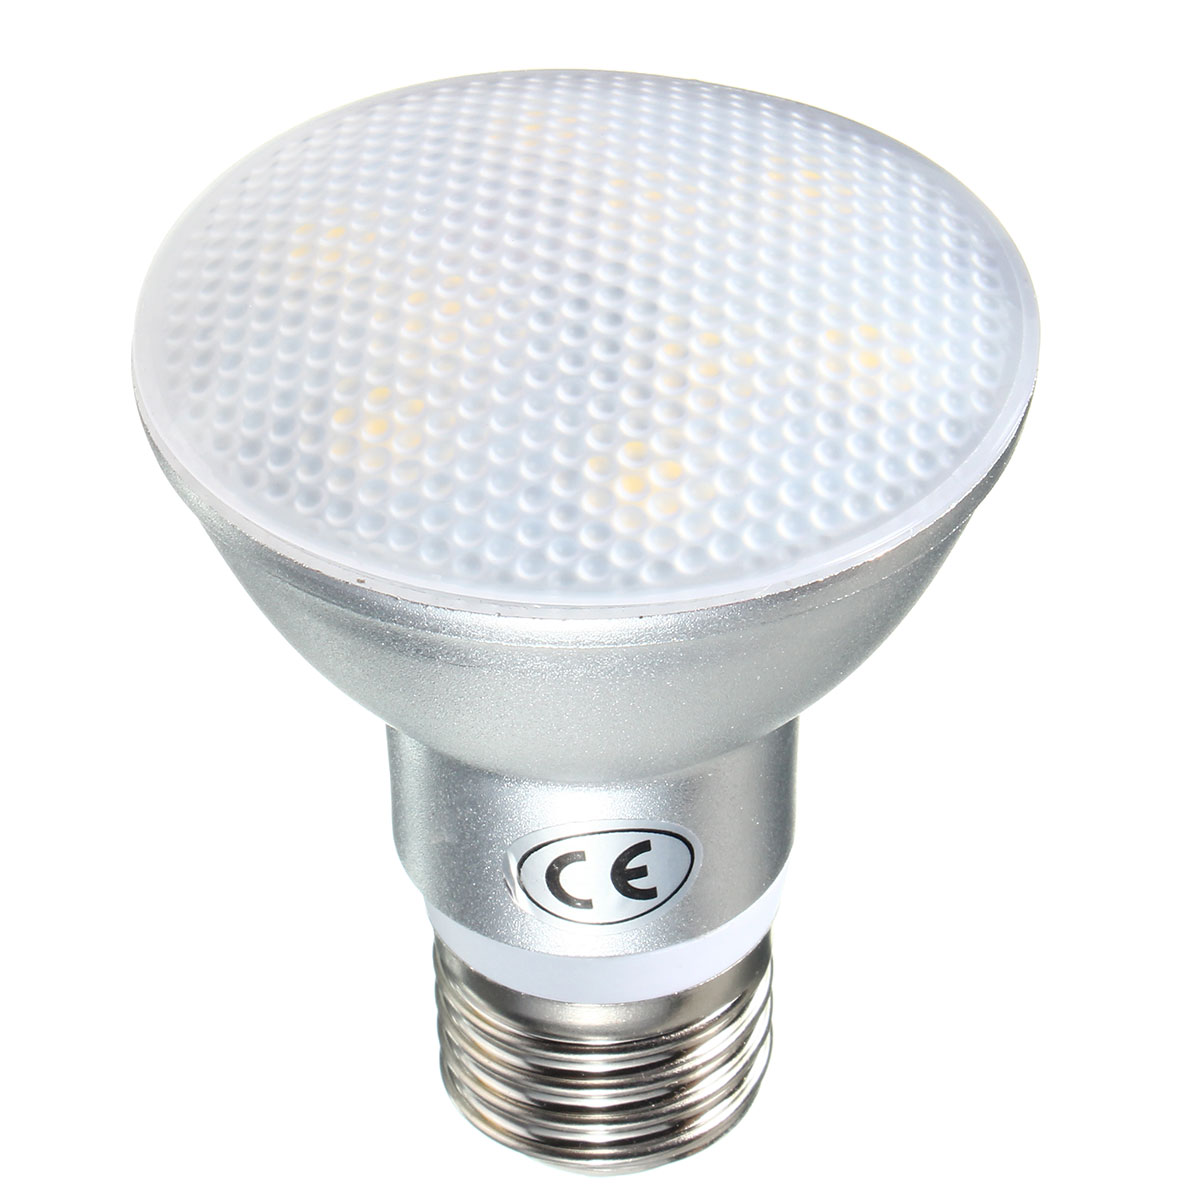 Newest E27 9W/12W/15W/18W PAR20 PAR30 PAR38 Waterproof IP65 LED Spot Light Bulb Lamp Indoor Lighting Dimmable AC220V(China (Mainland))